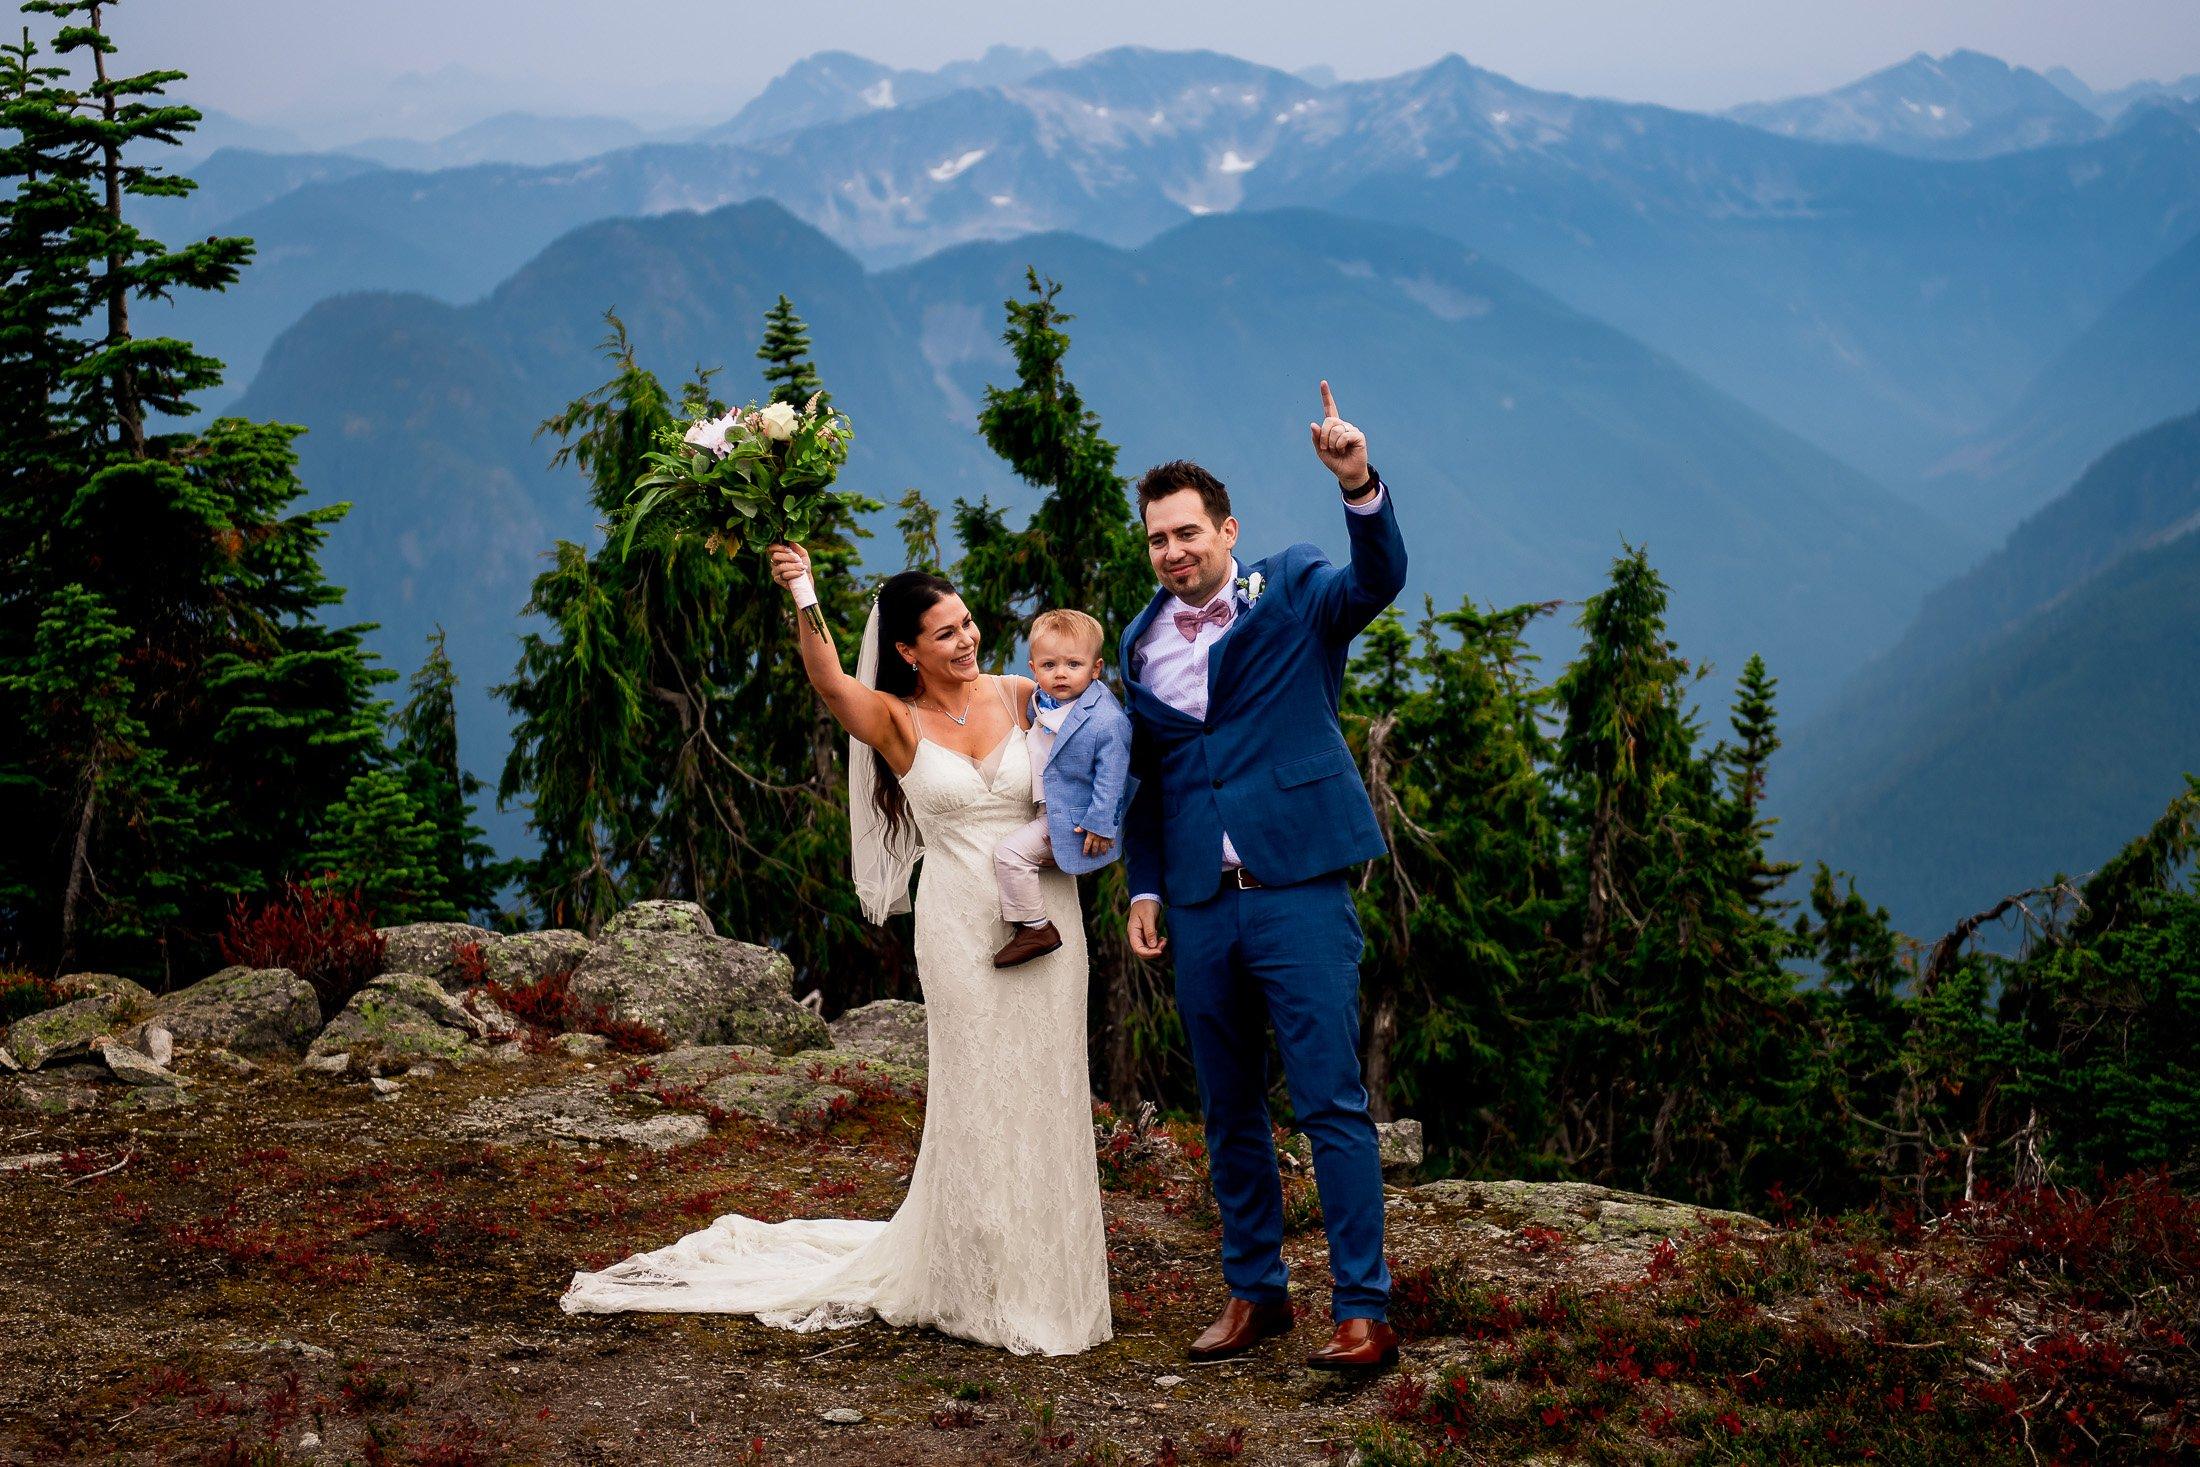 005 - helicopter mountain wedding